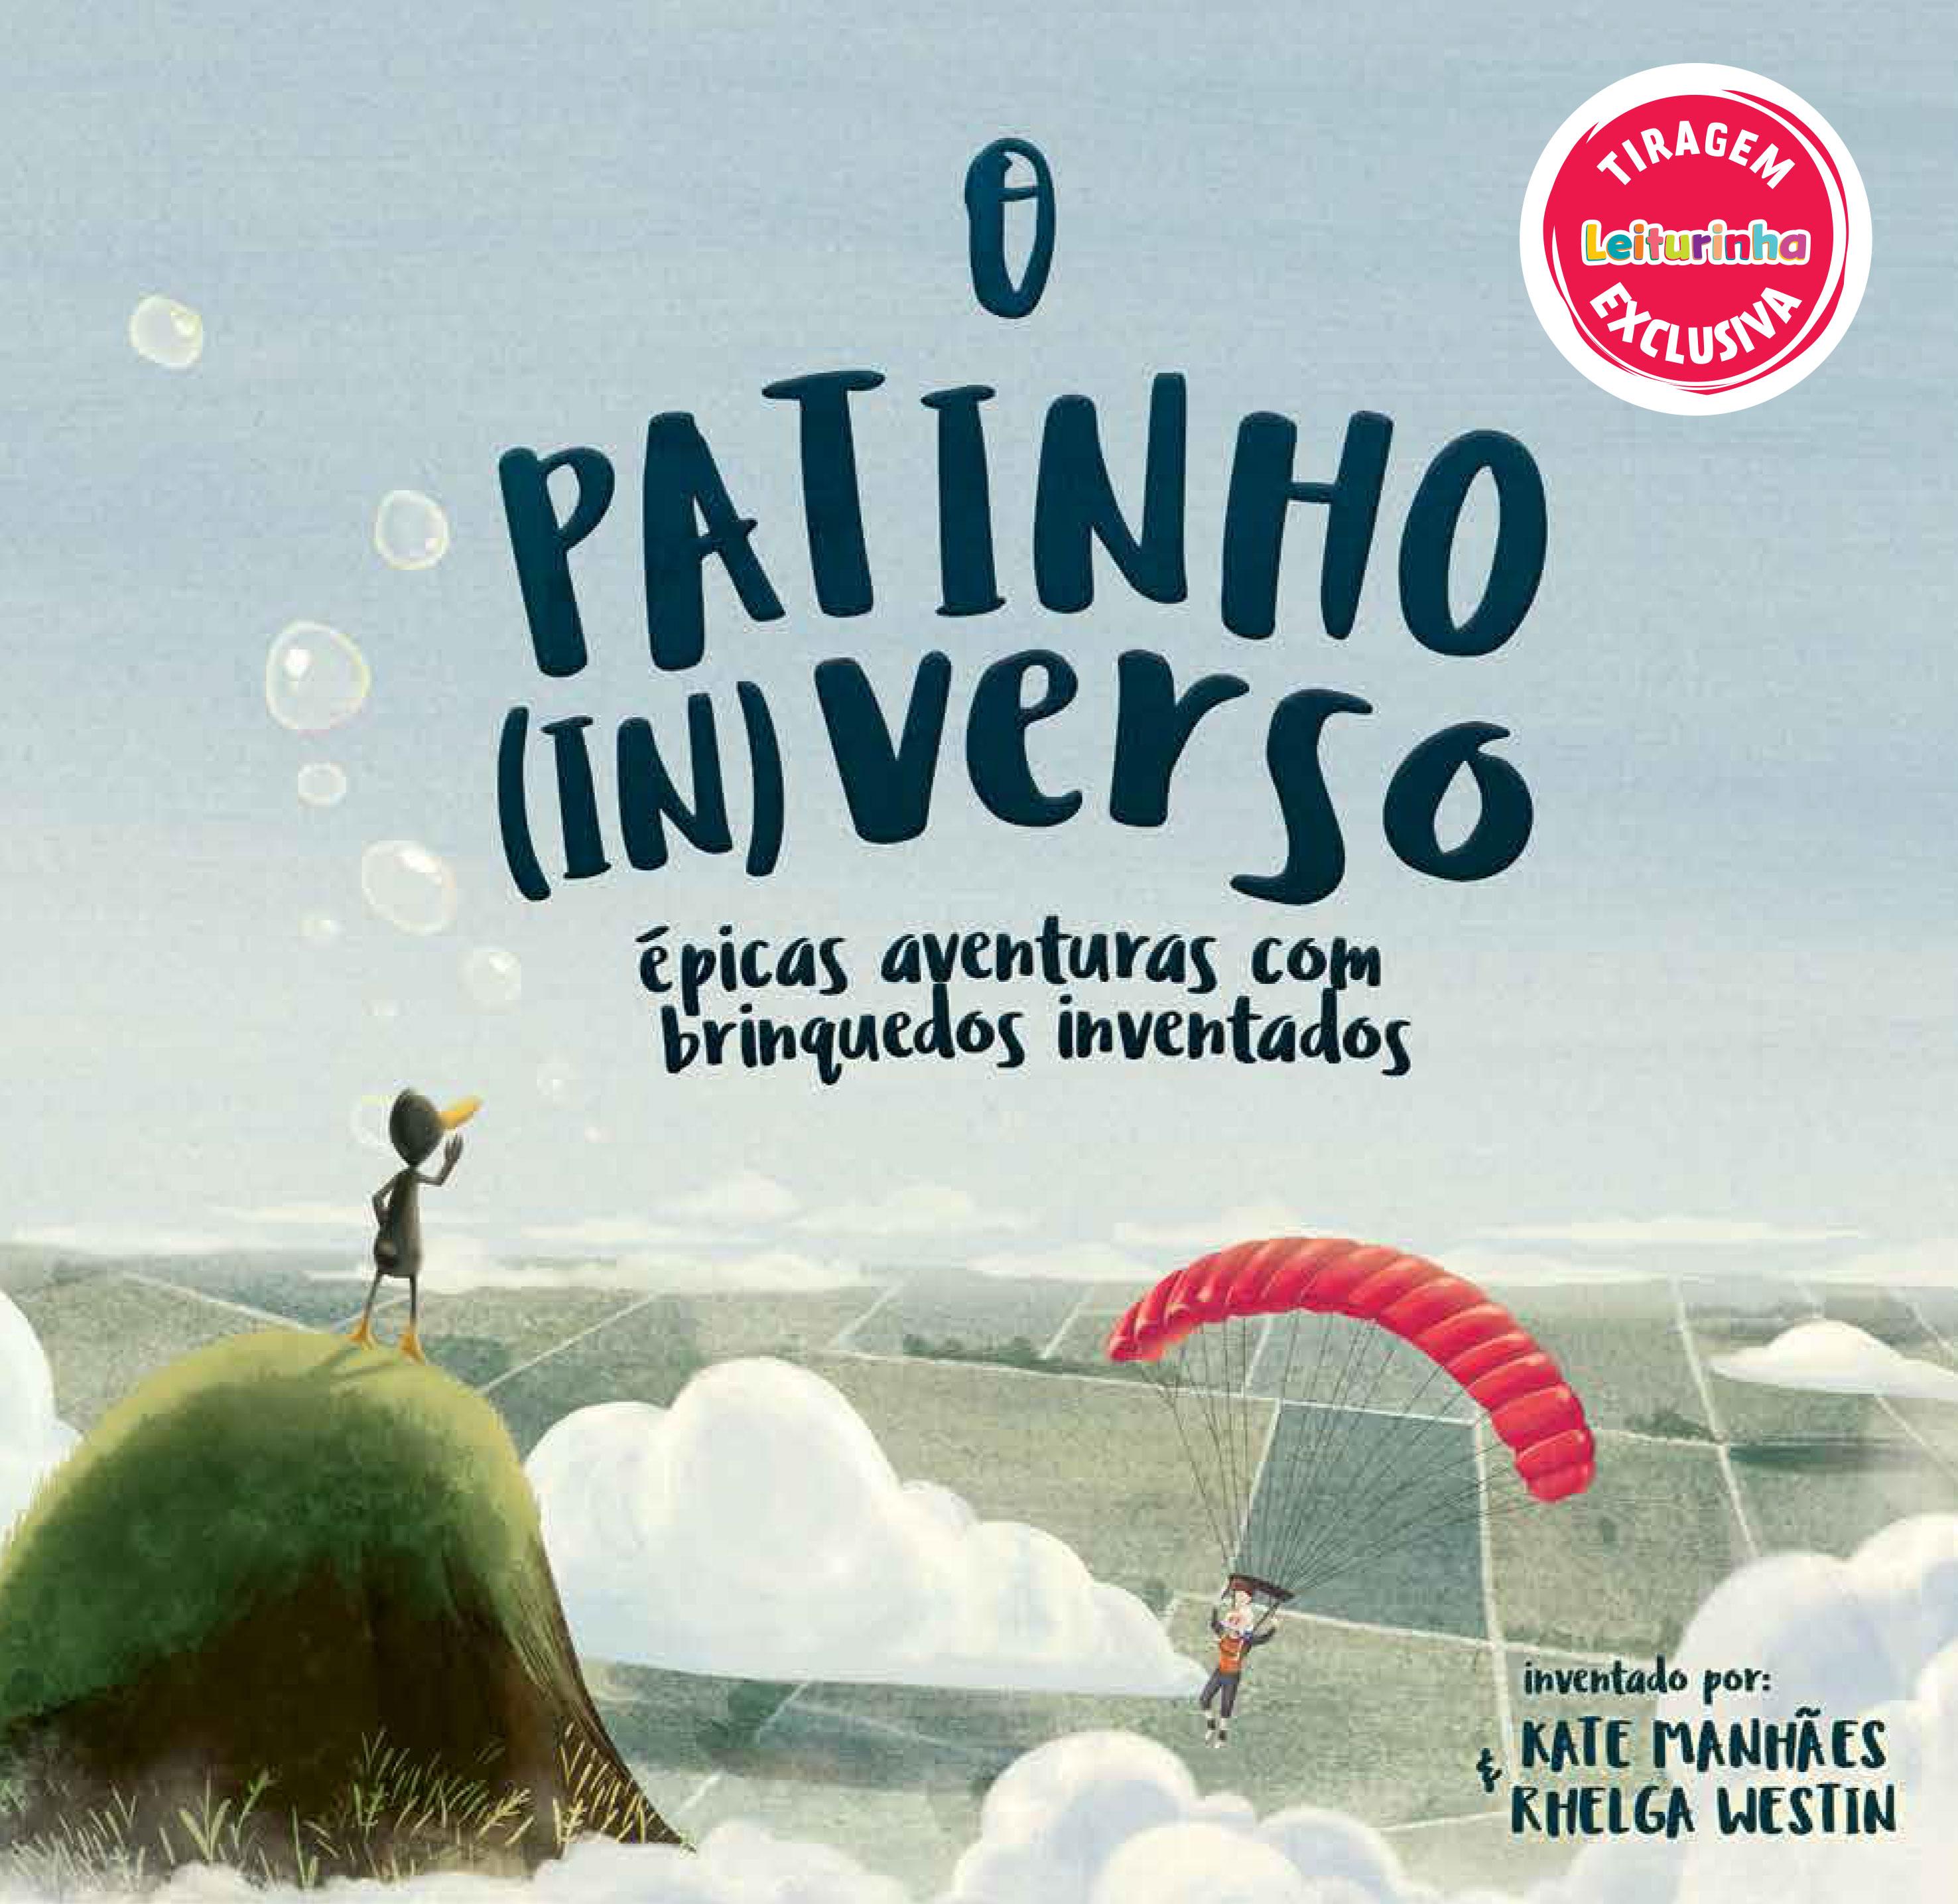 patinho_inverso